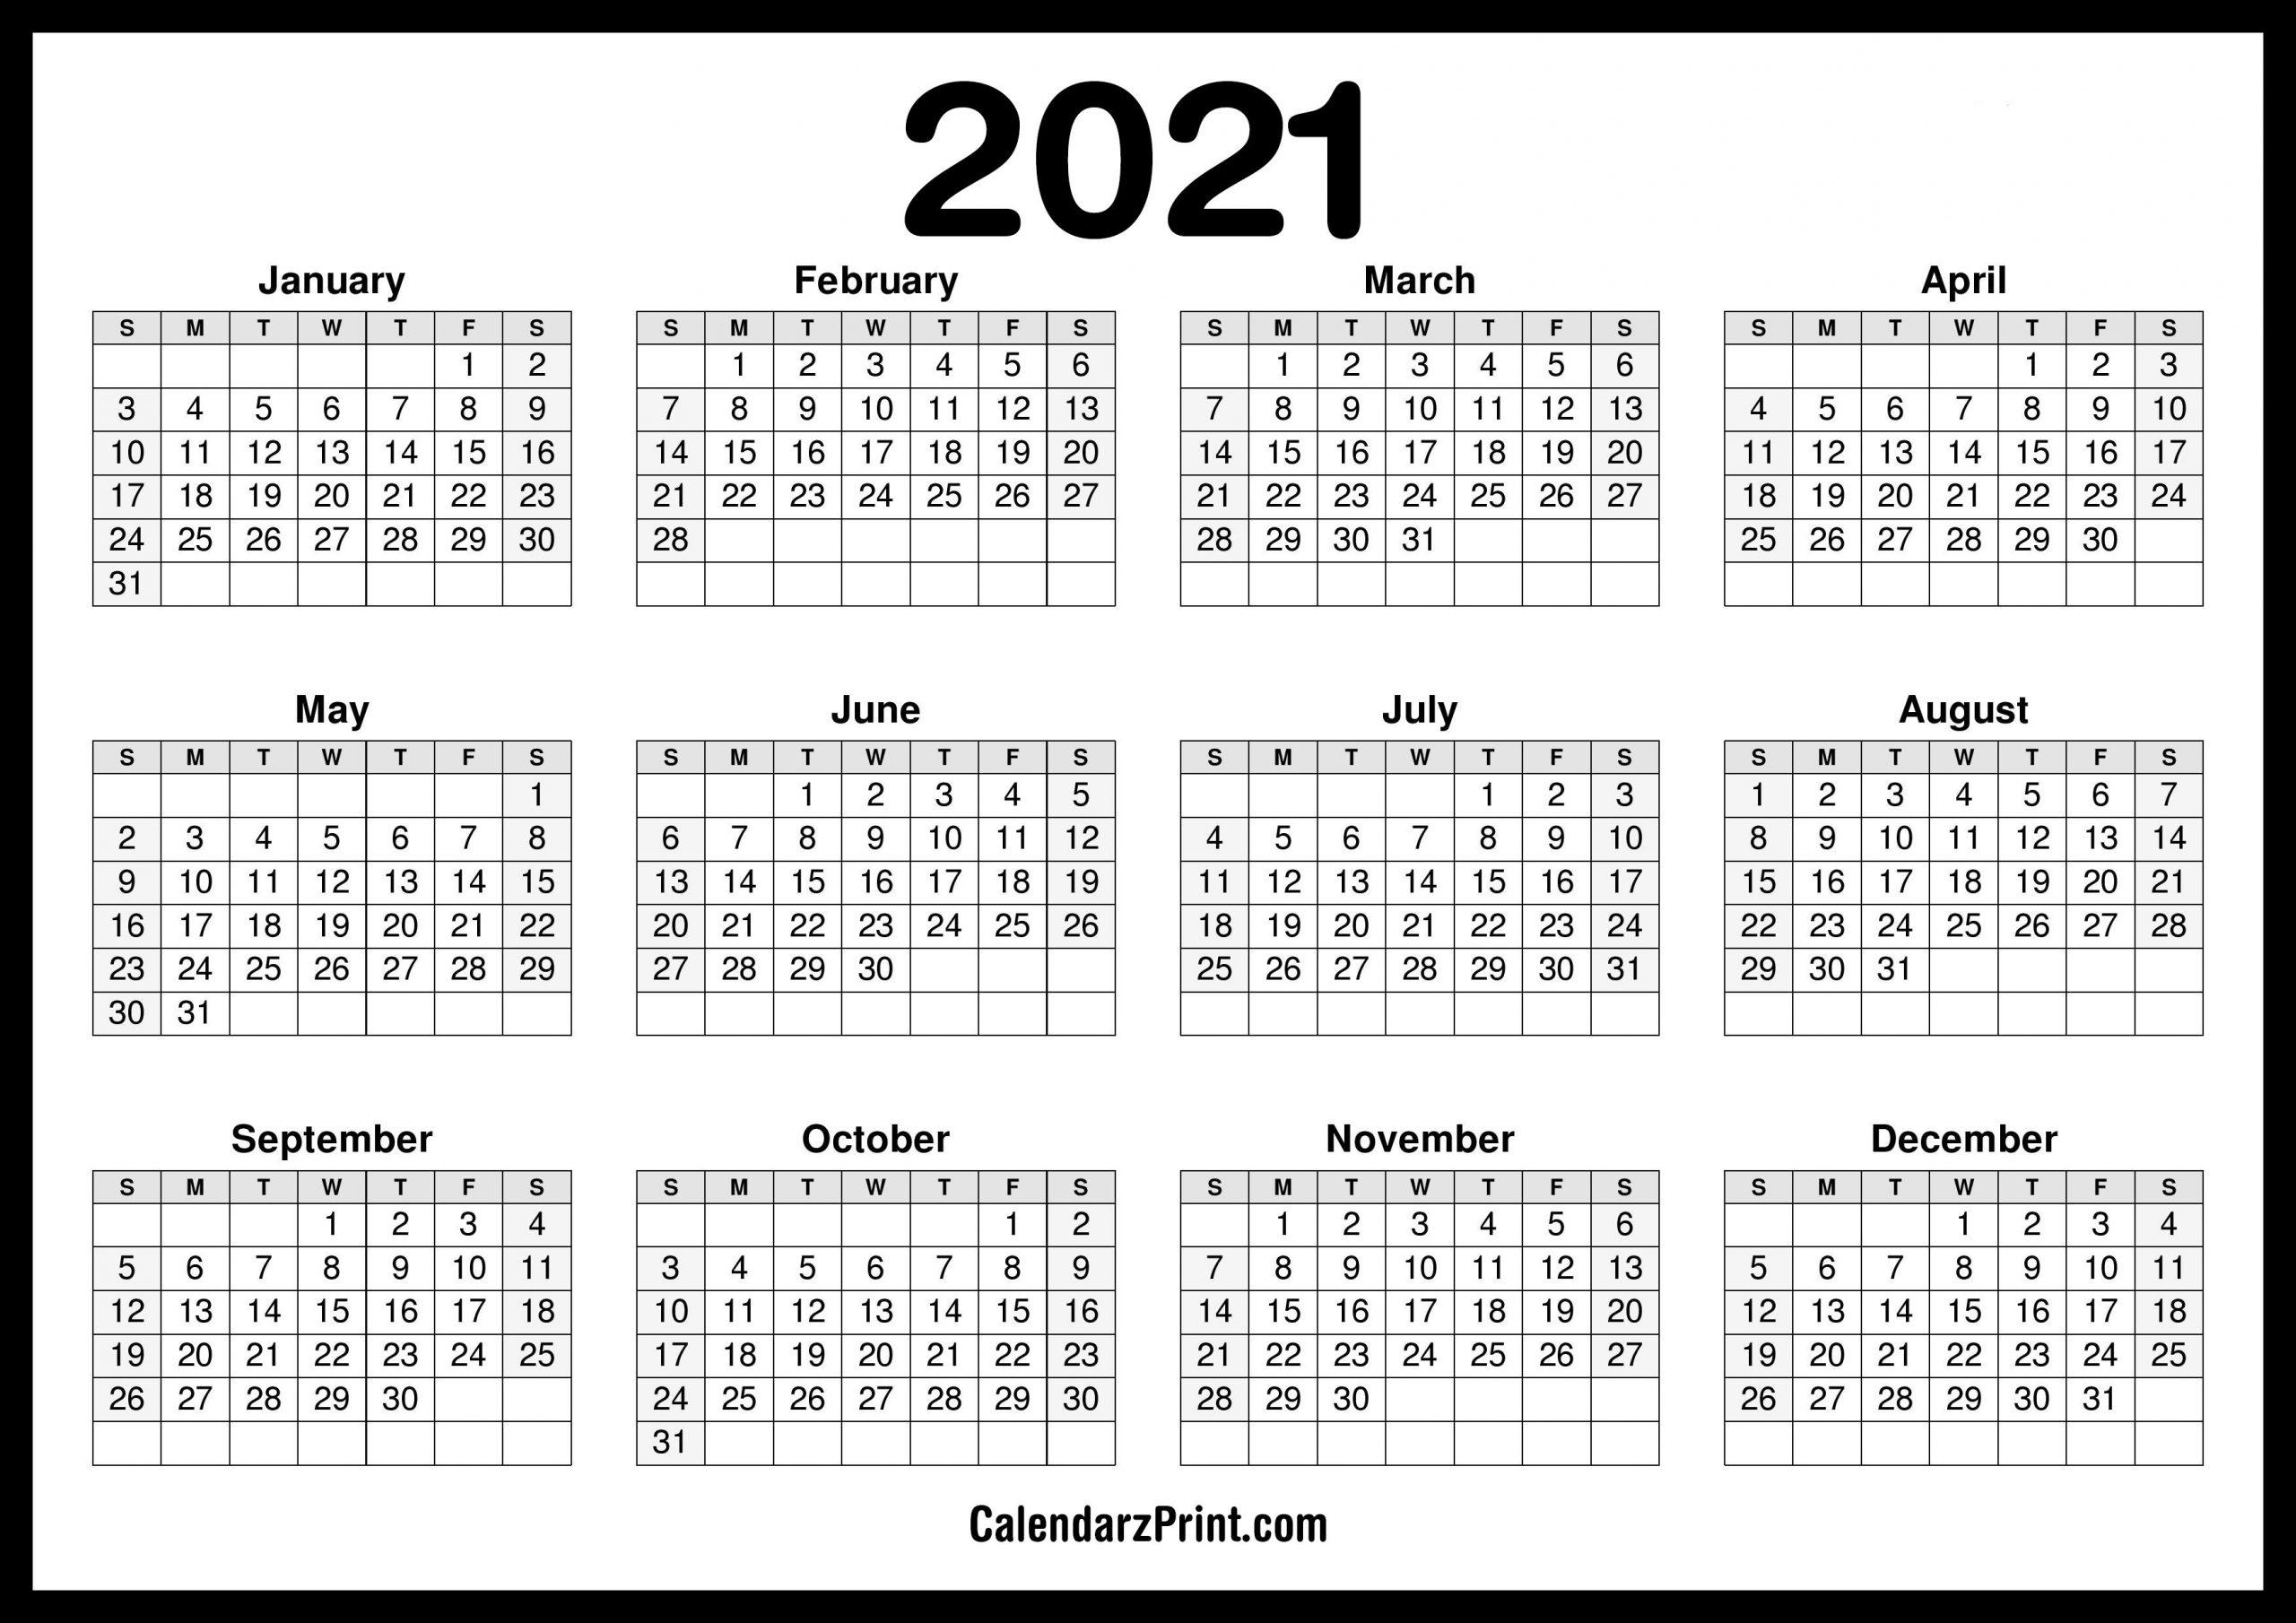 2021 Calendar Printable Free, Horizontal, Hd, Black